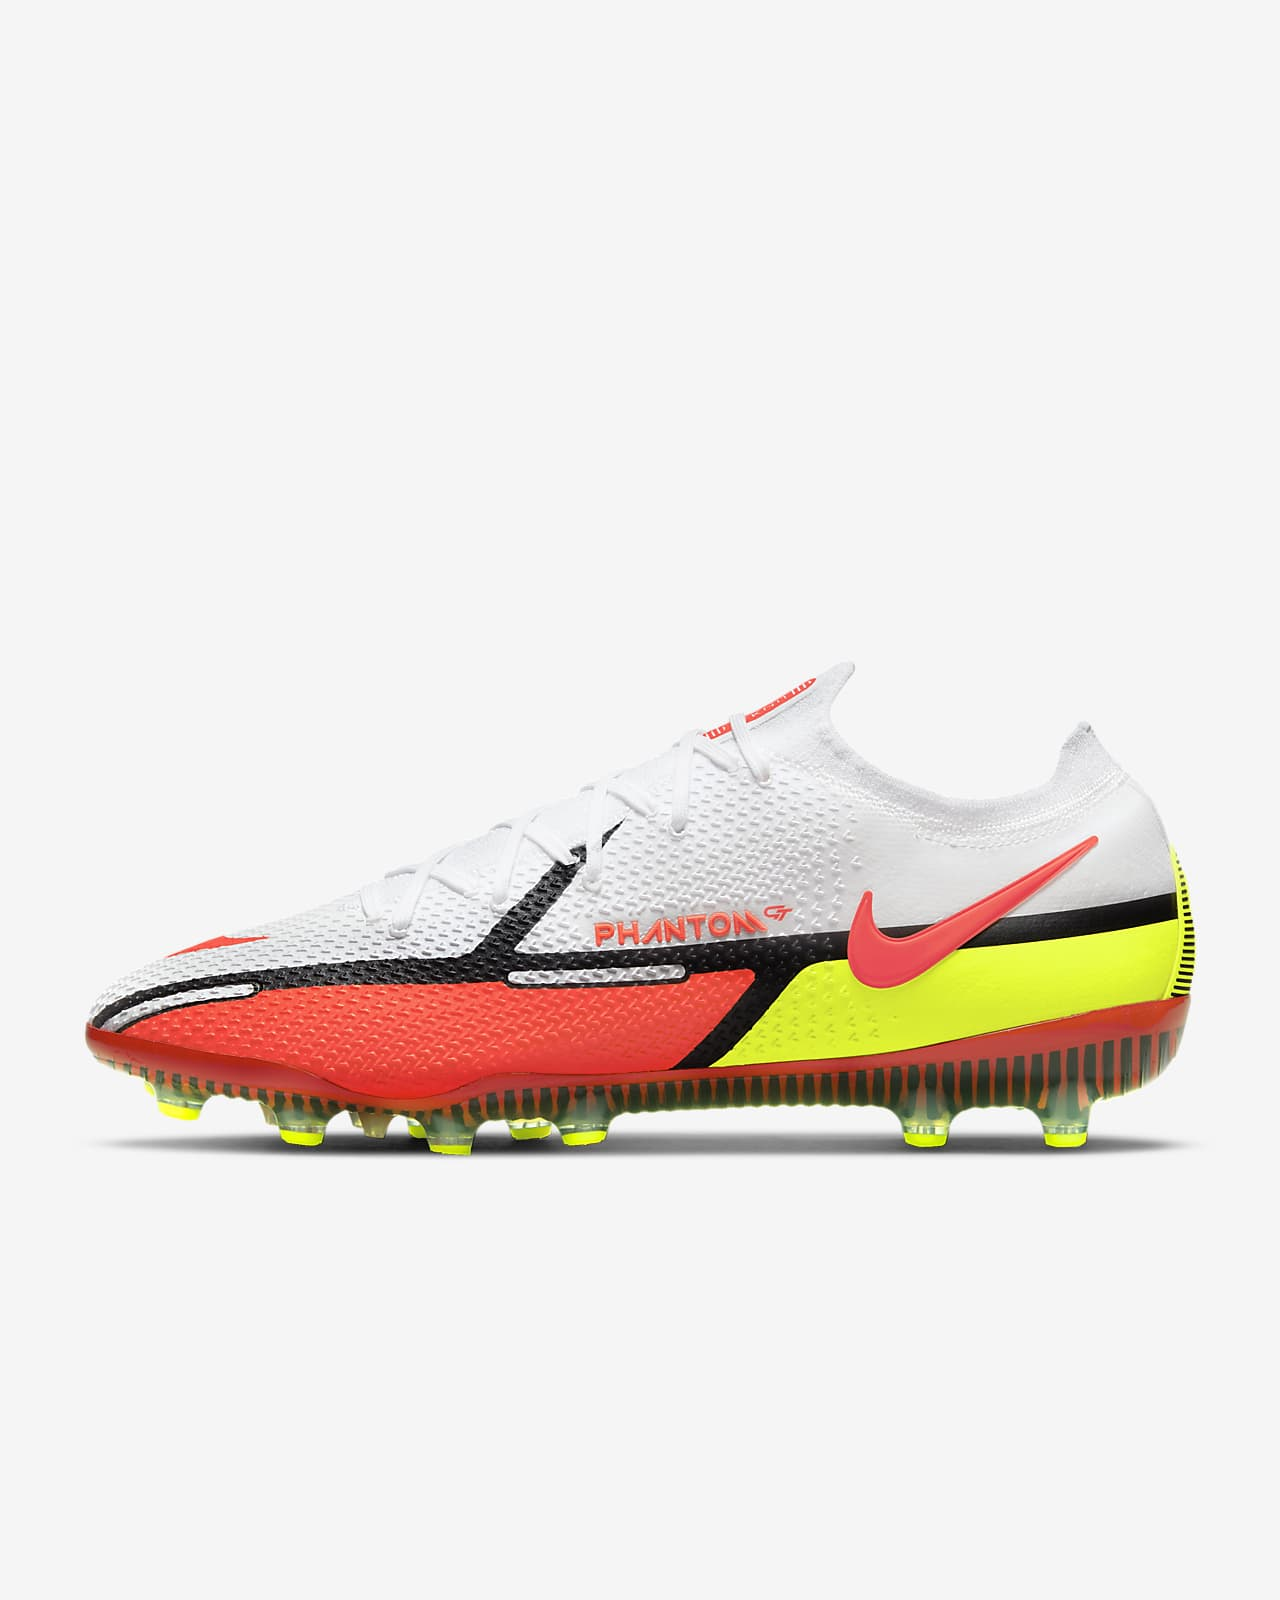 Scarpa da calcio per erba artificiale Nike Phantom GT2 Elite AG-Pro